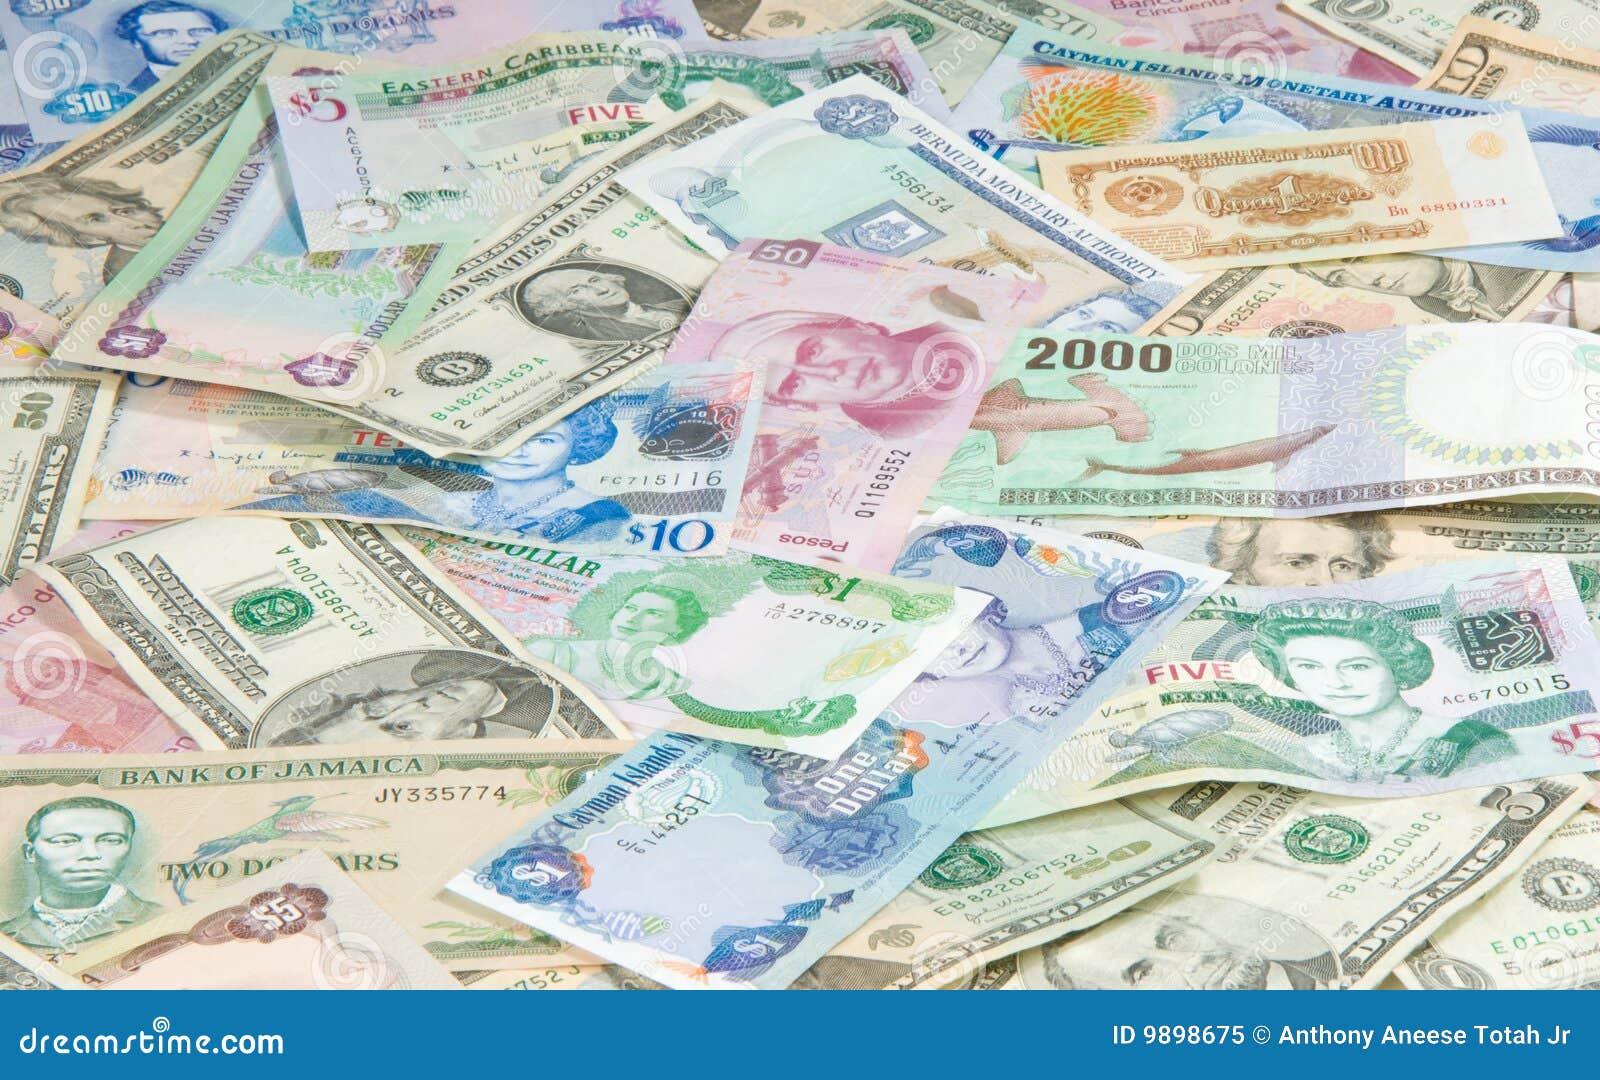 Economic Effects of Globalization Essay